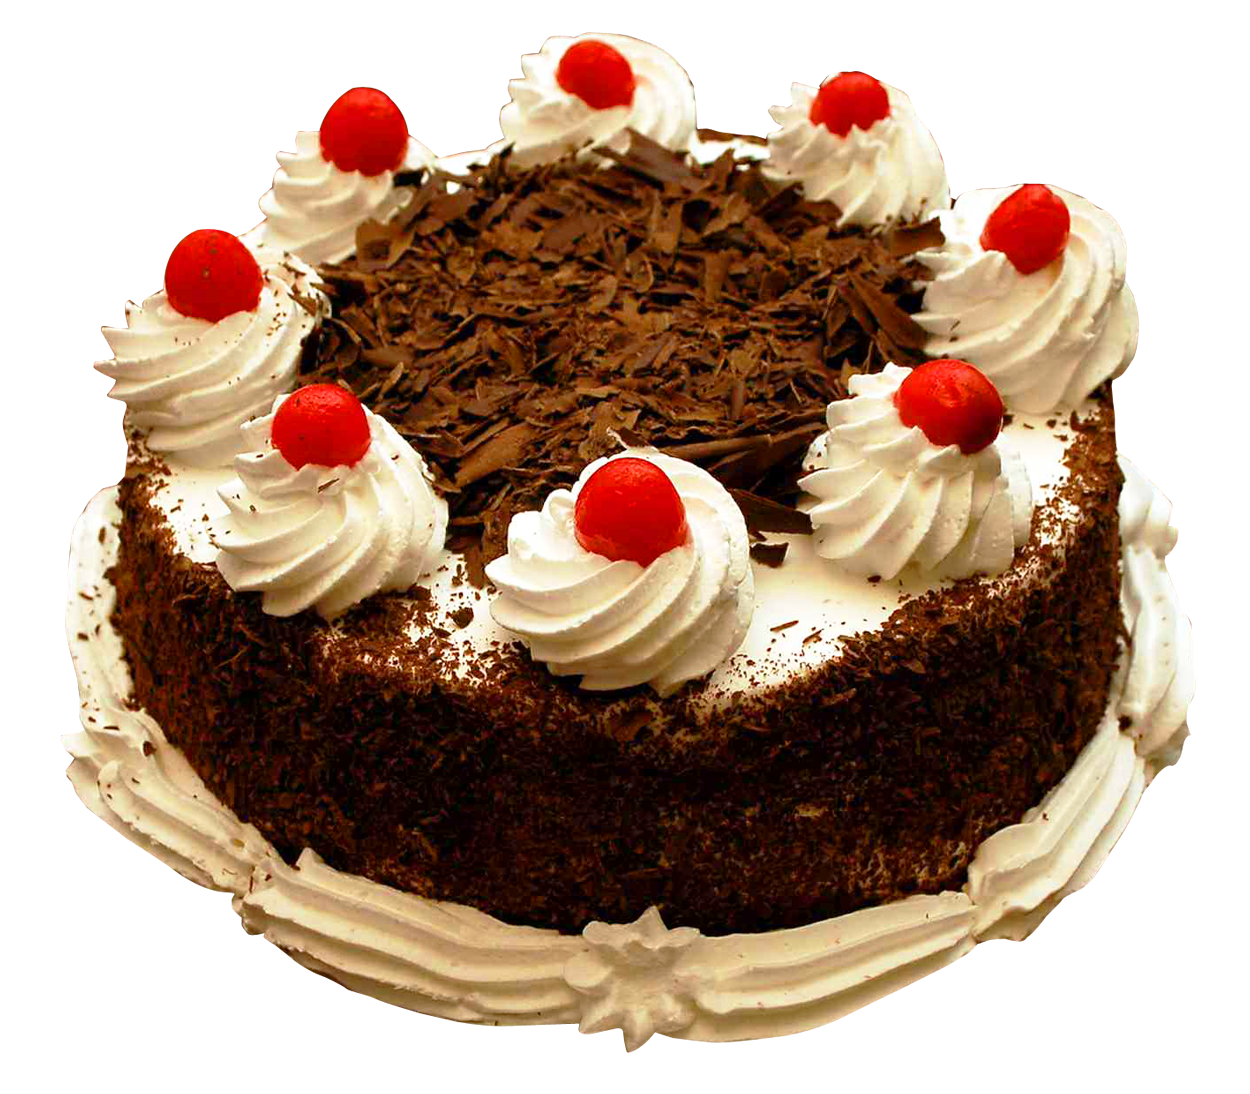 Chocolate Cake Png Image Purepng Free Transparent Cc0